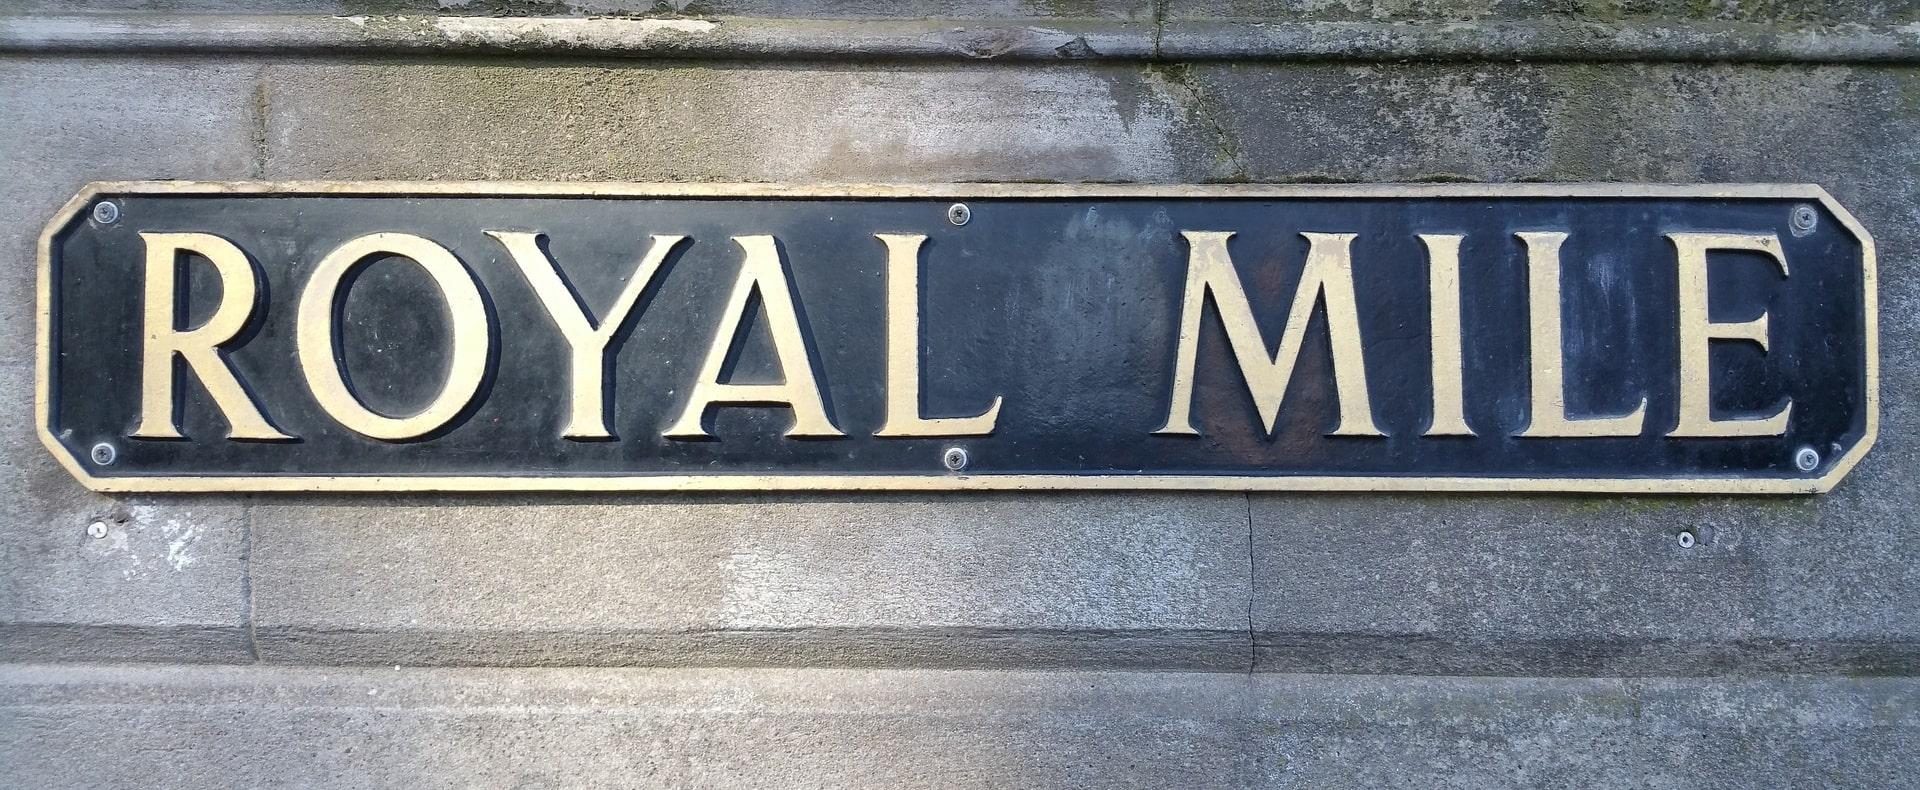 Edinburgh Royal Mile Experience Gallery